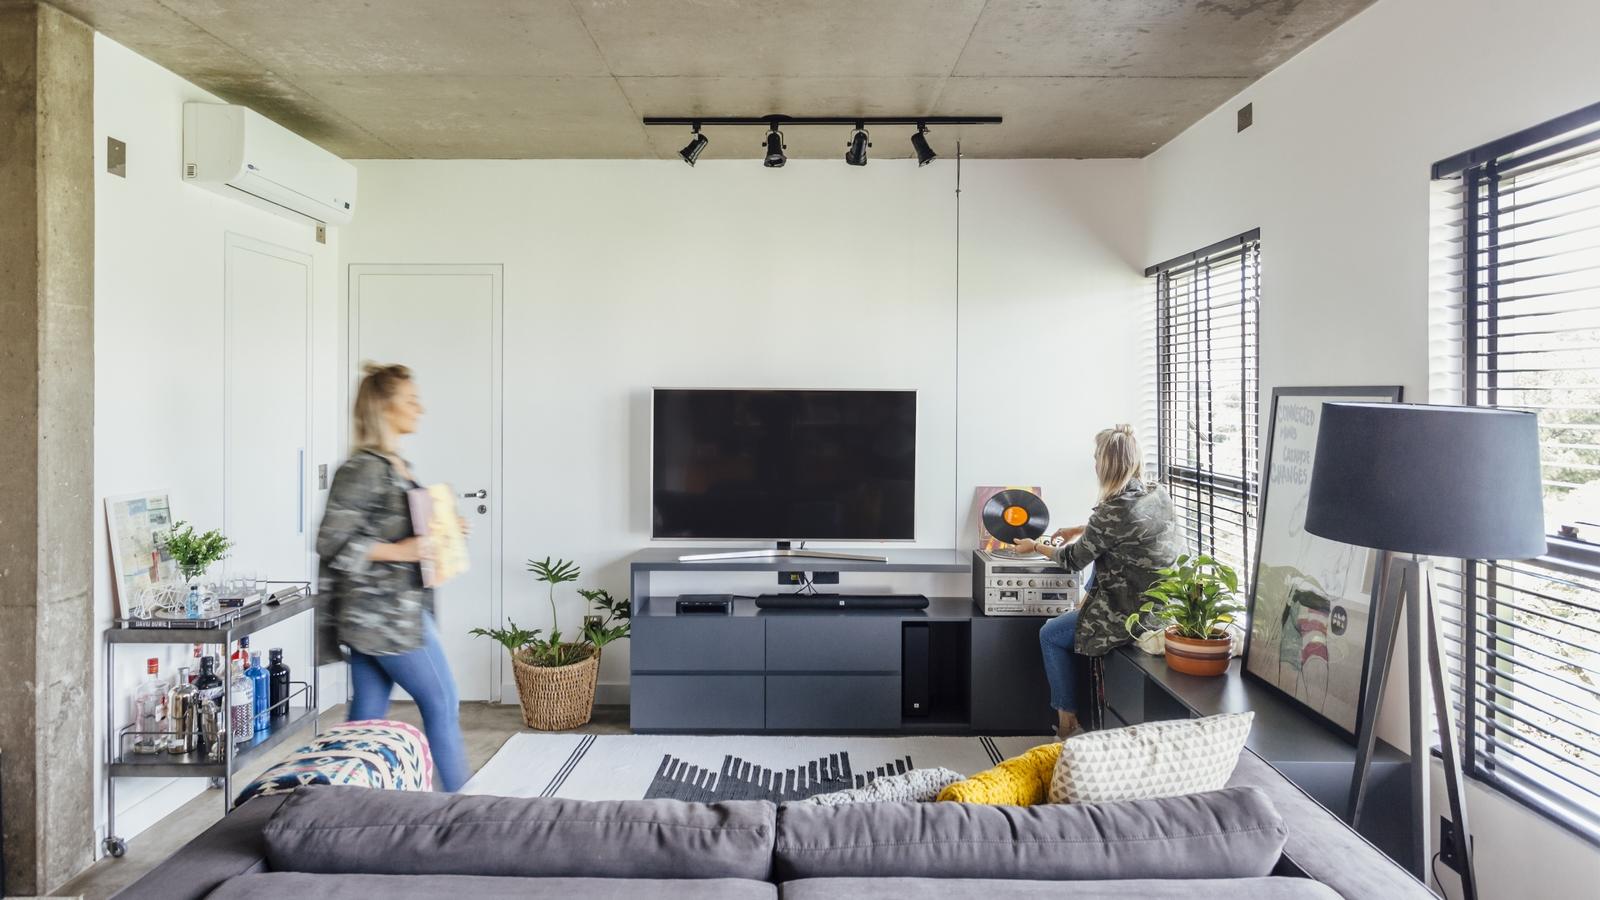 Apartamento Maxhaus -9 (Copiar)